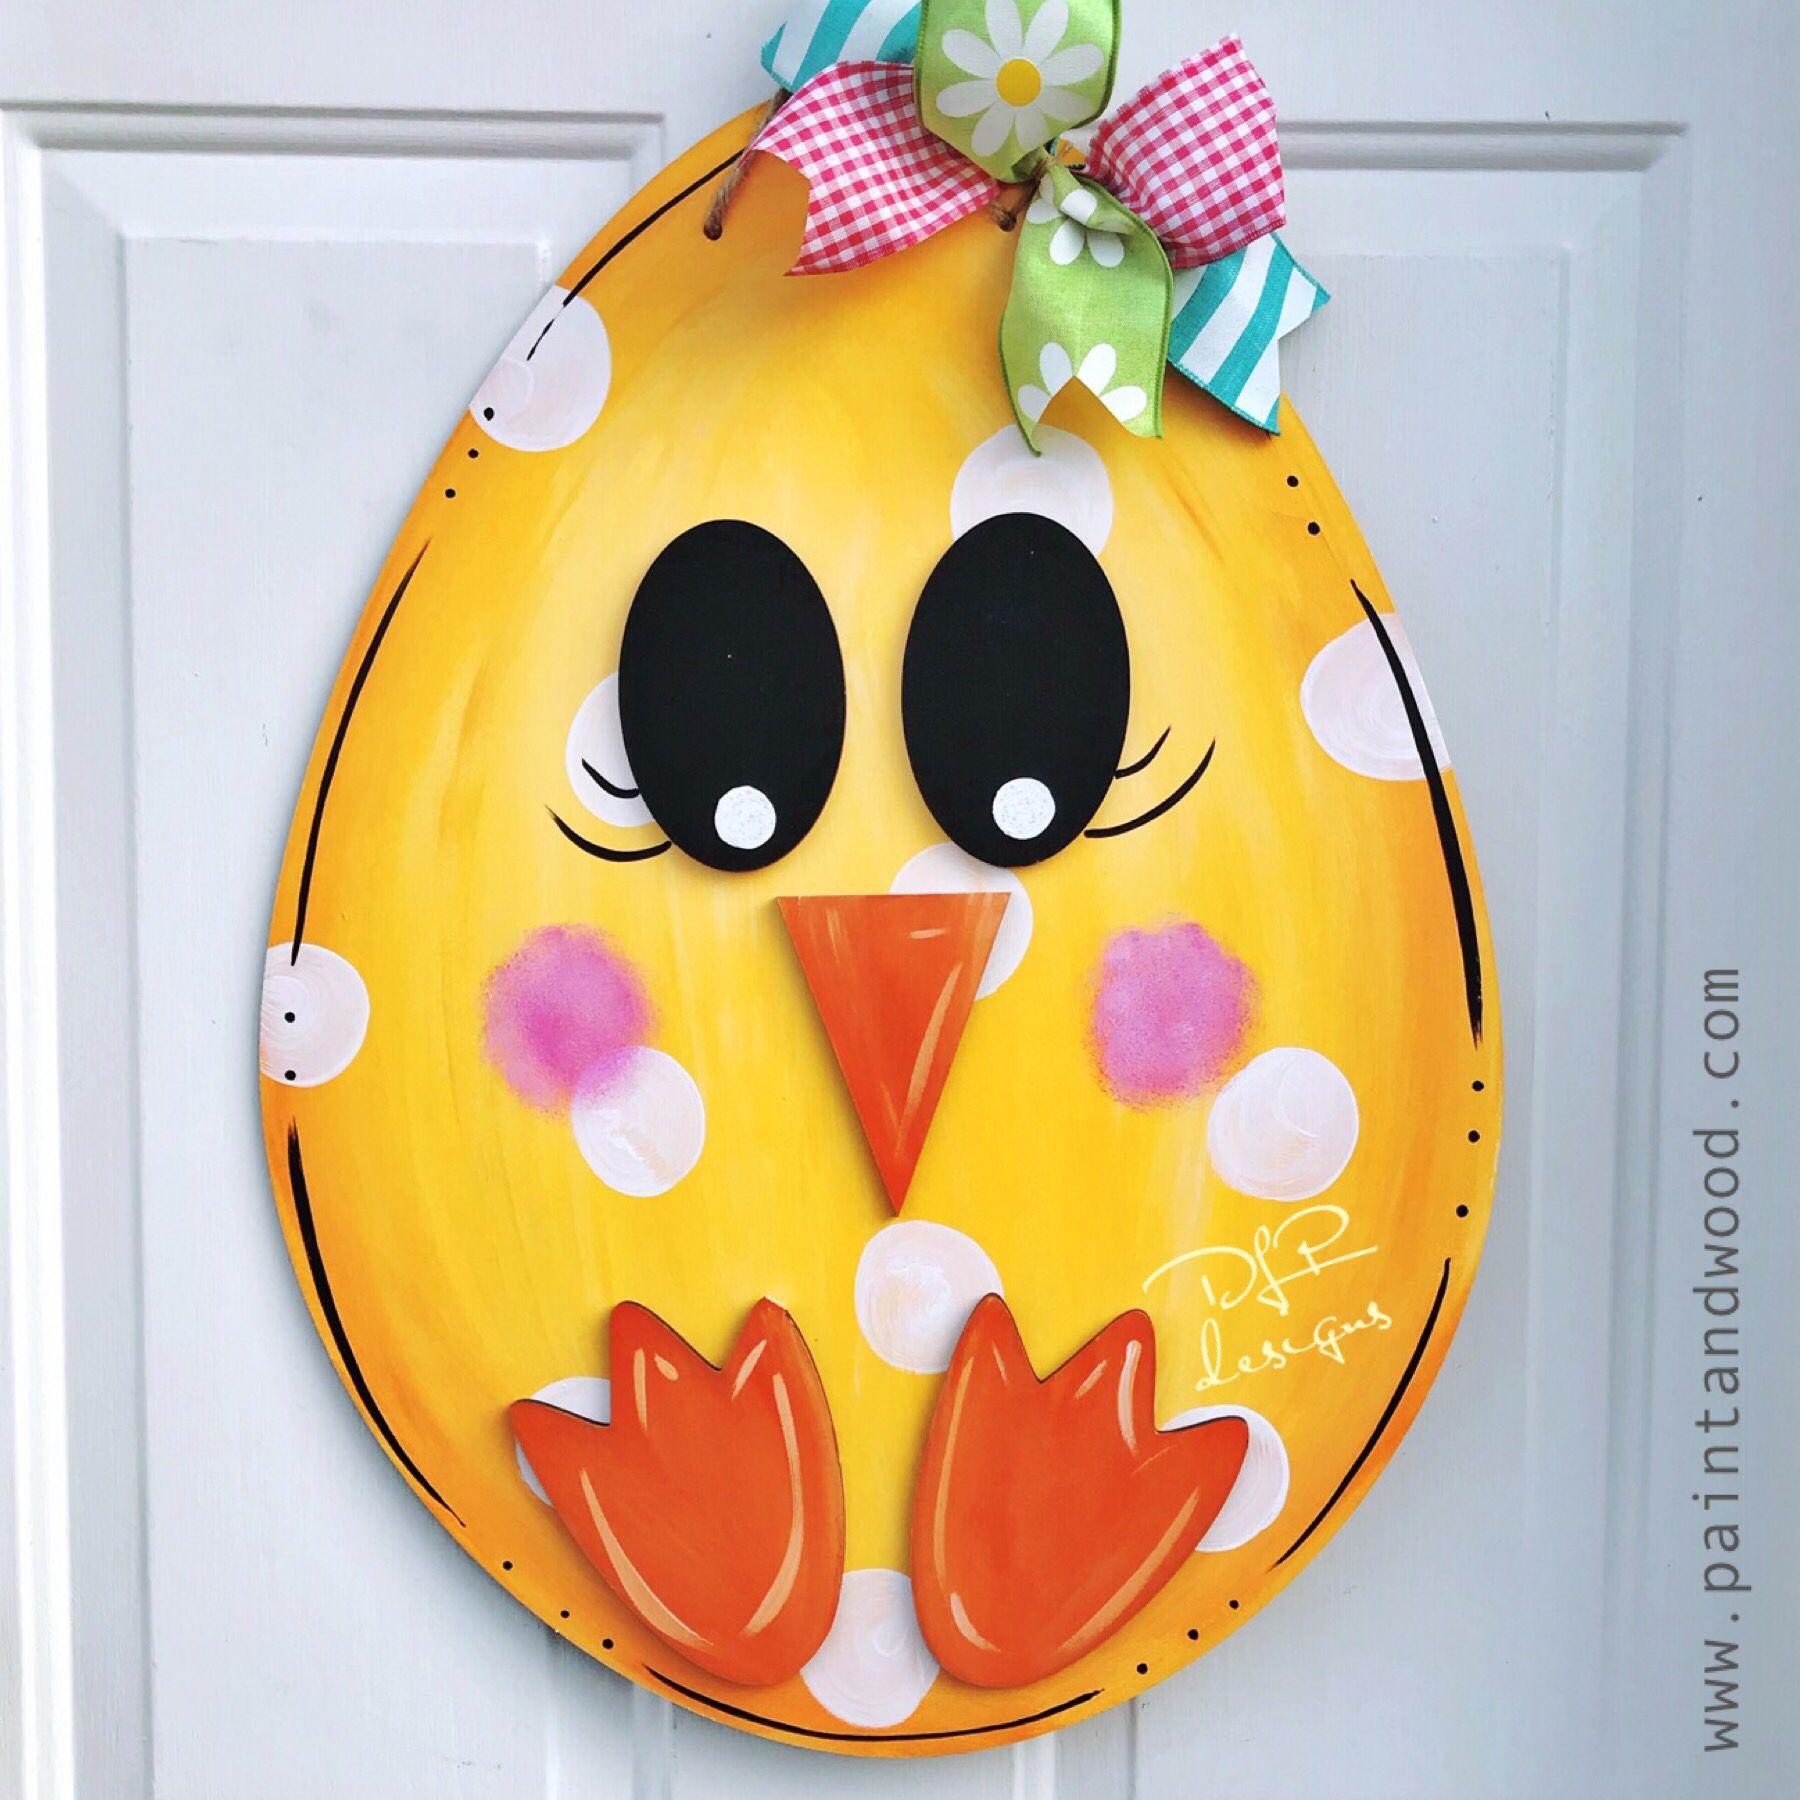 New 12 Pcs DIY Blank Slap Bracelets Party Favors Easter Gifts for Kids Art Craft